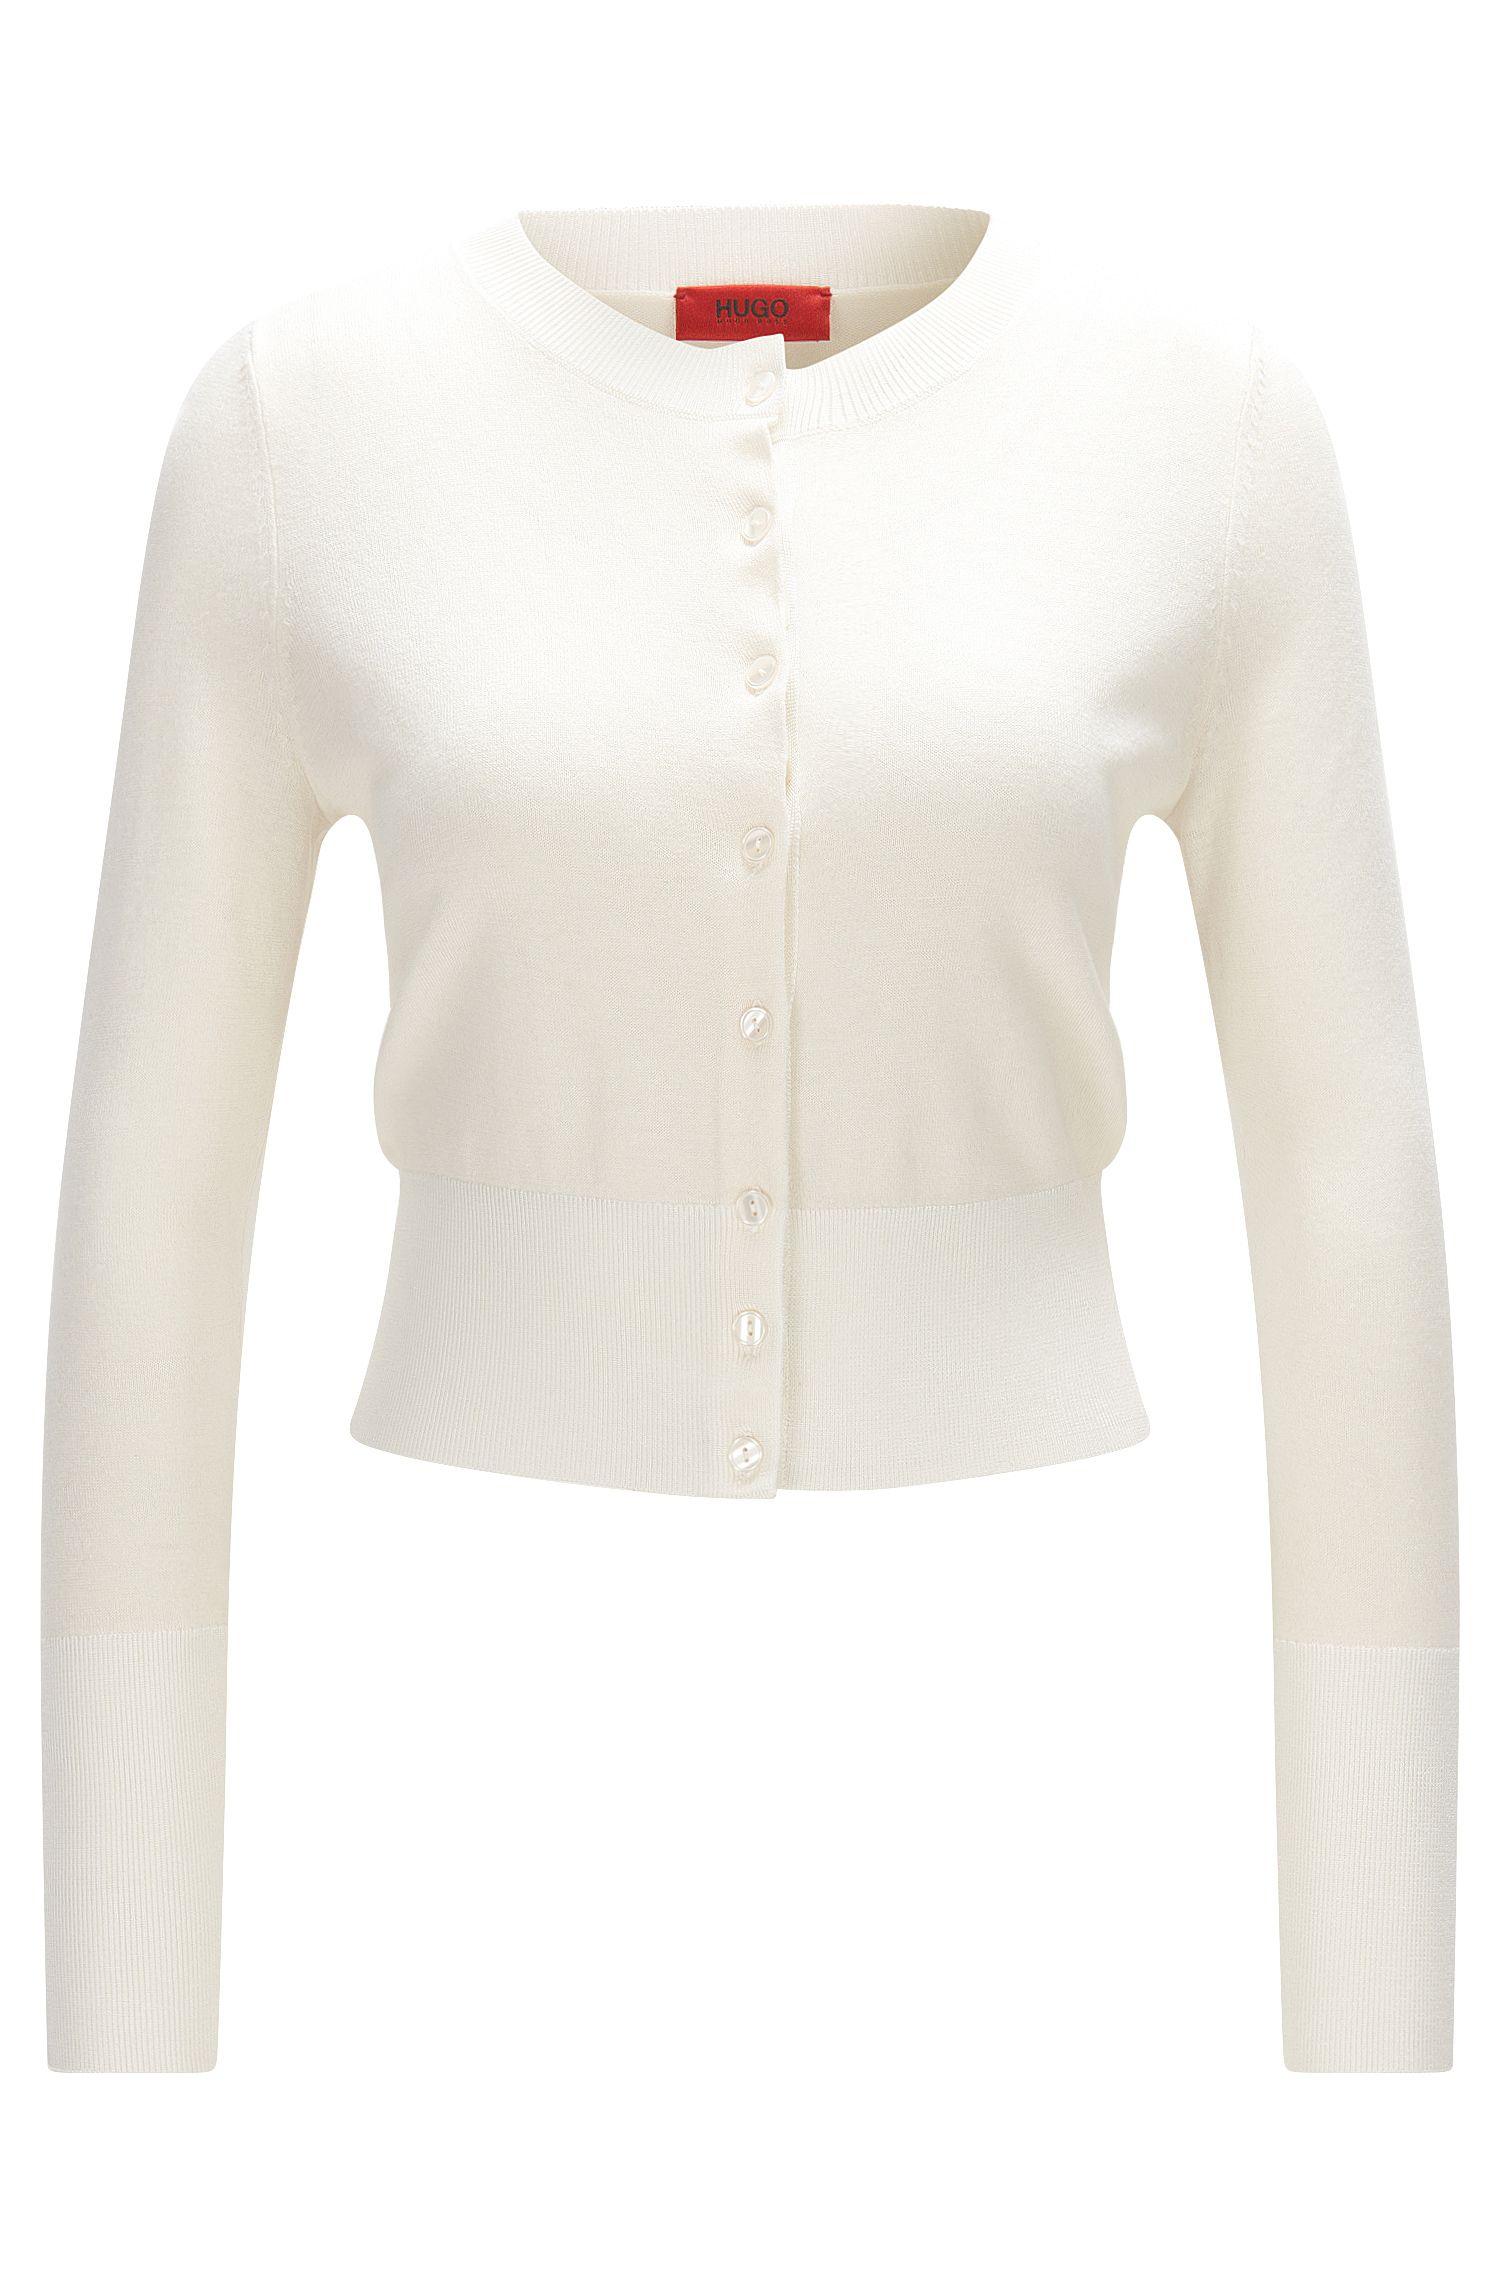 Short cardigan in a silk-cotton blend